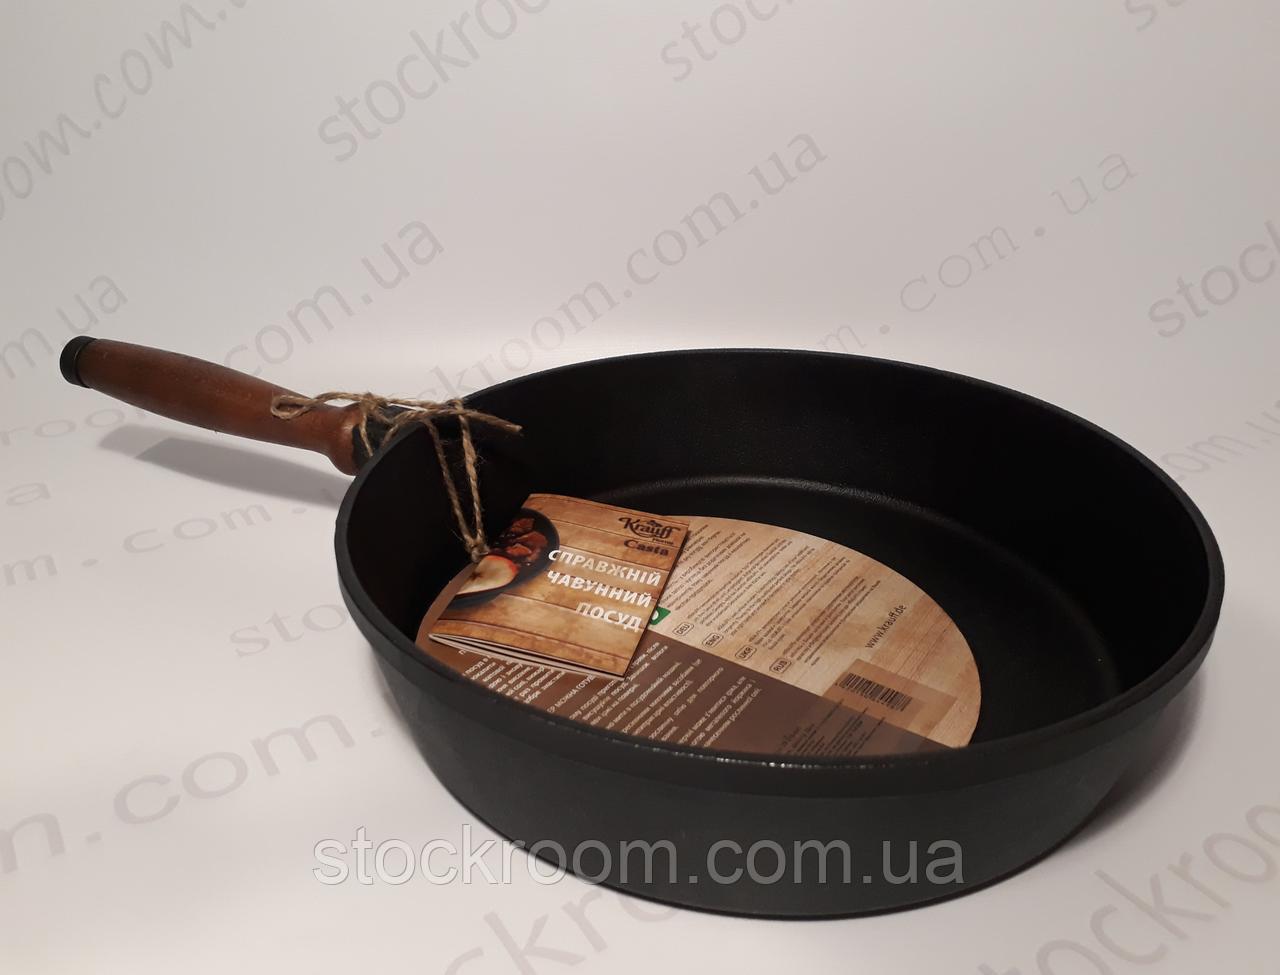 Сковорода чугунная Krauff 29-210-005  Ø 28 см